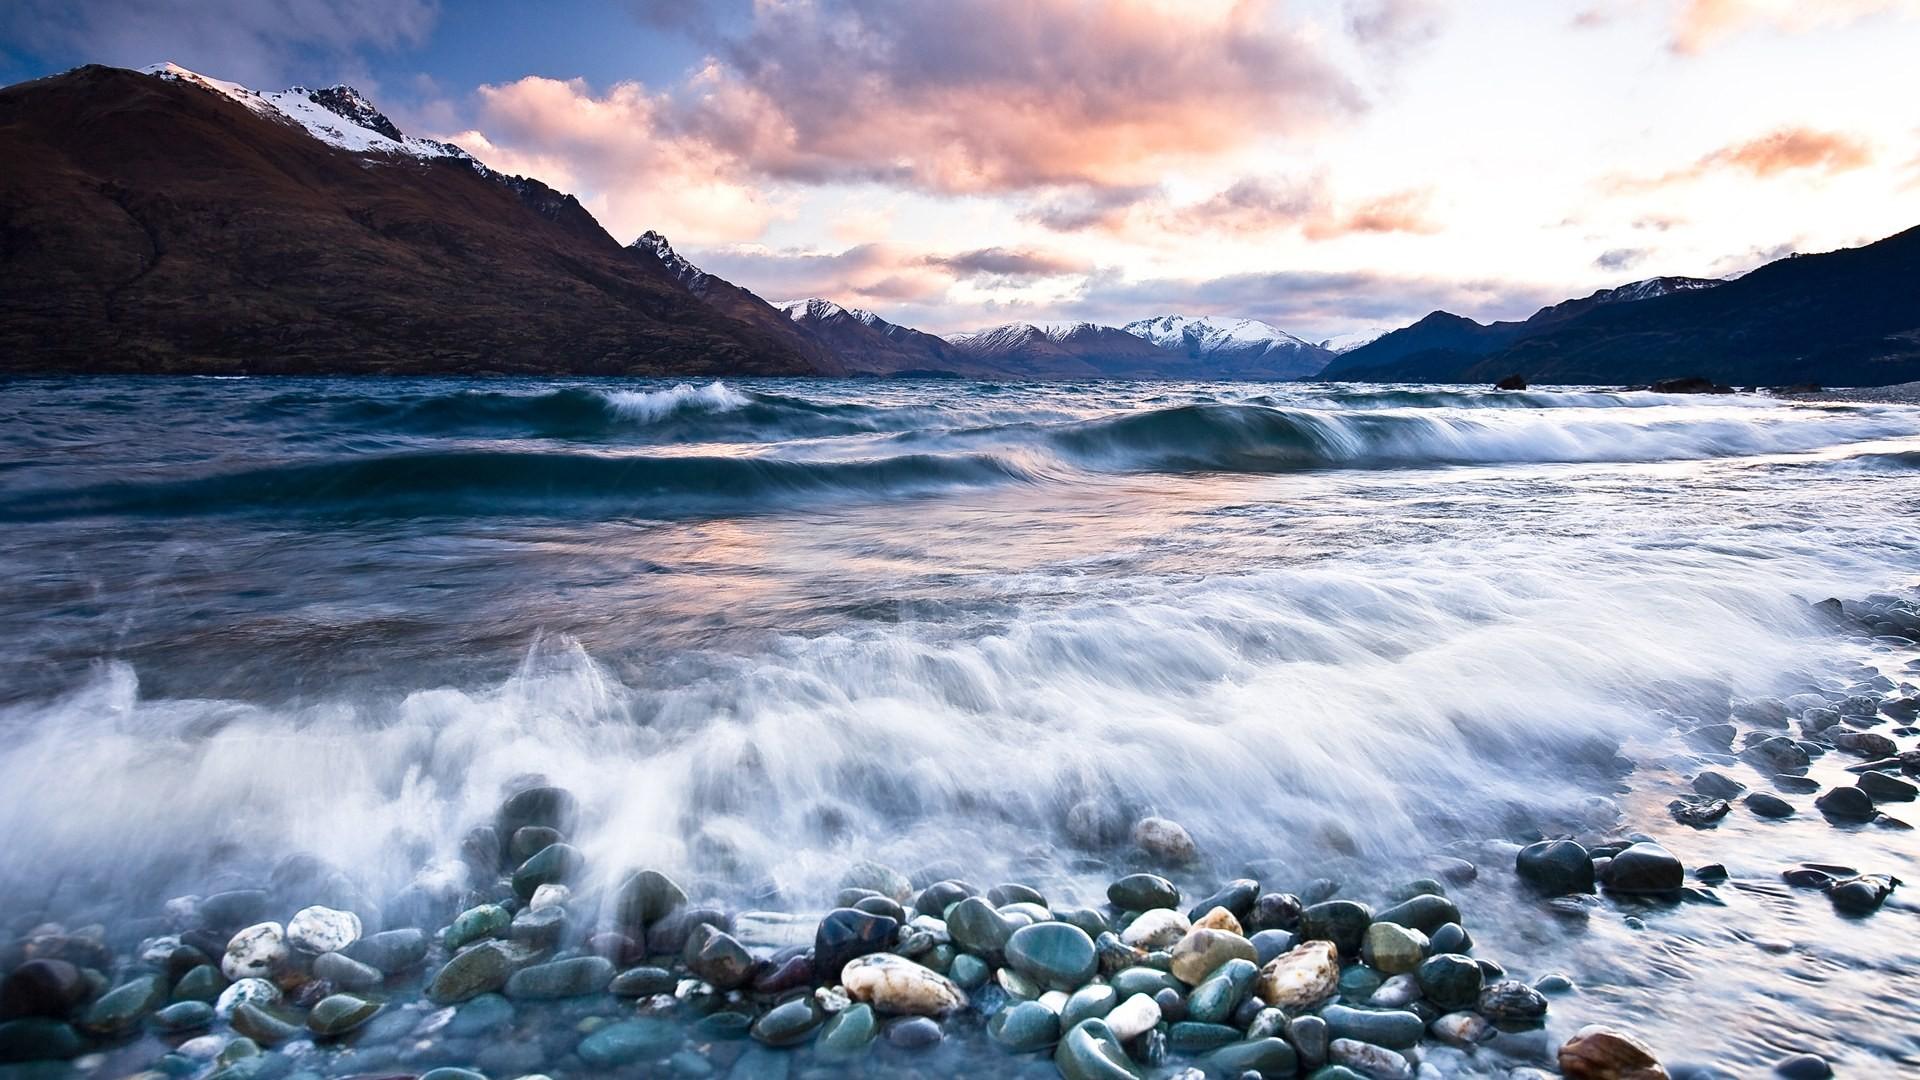 rocky shore wallpaper 33957 1920x1080 px